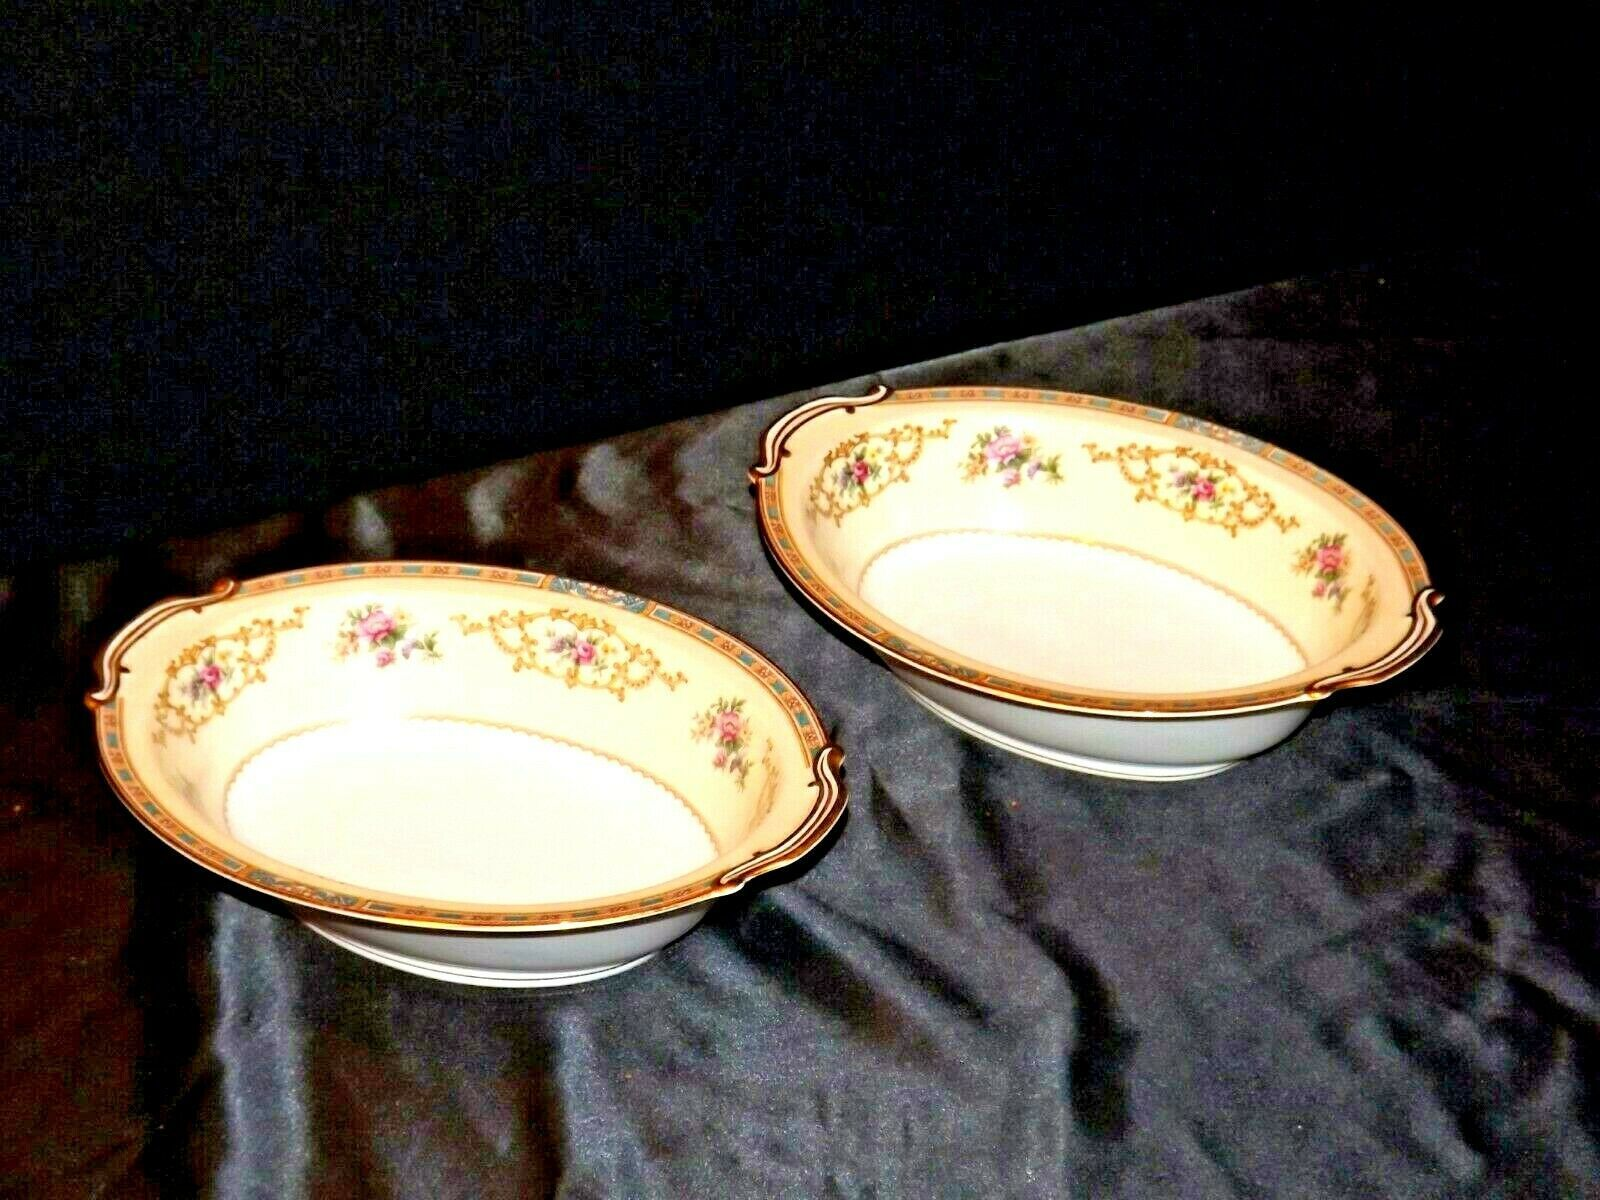 Noritake China Serving Bowls Colby 5032 AA19-1467 Vintage